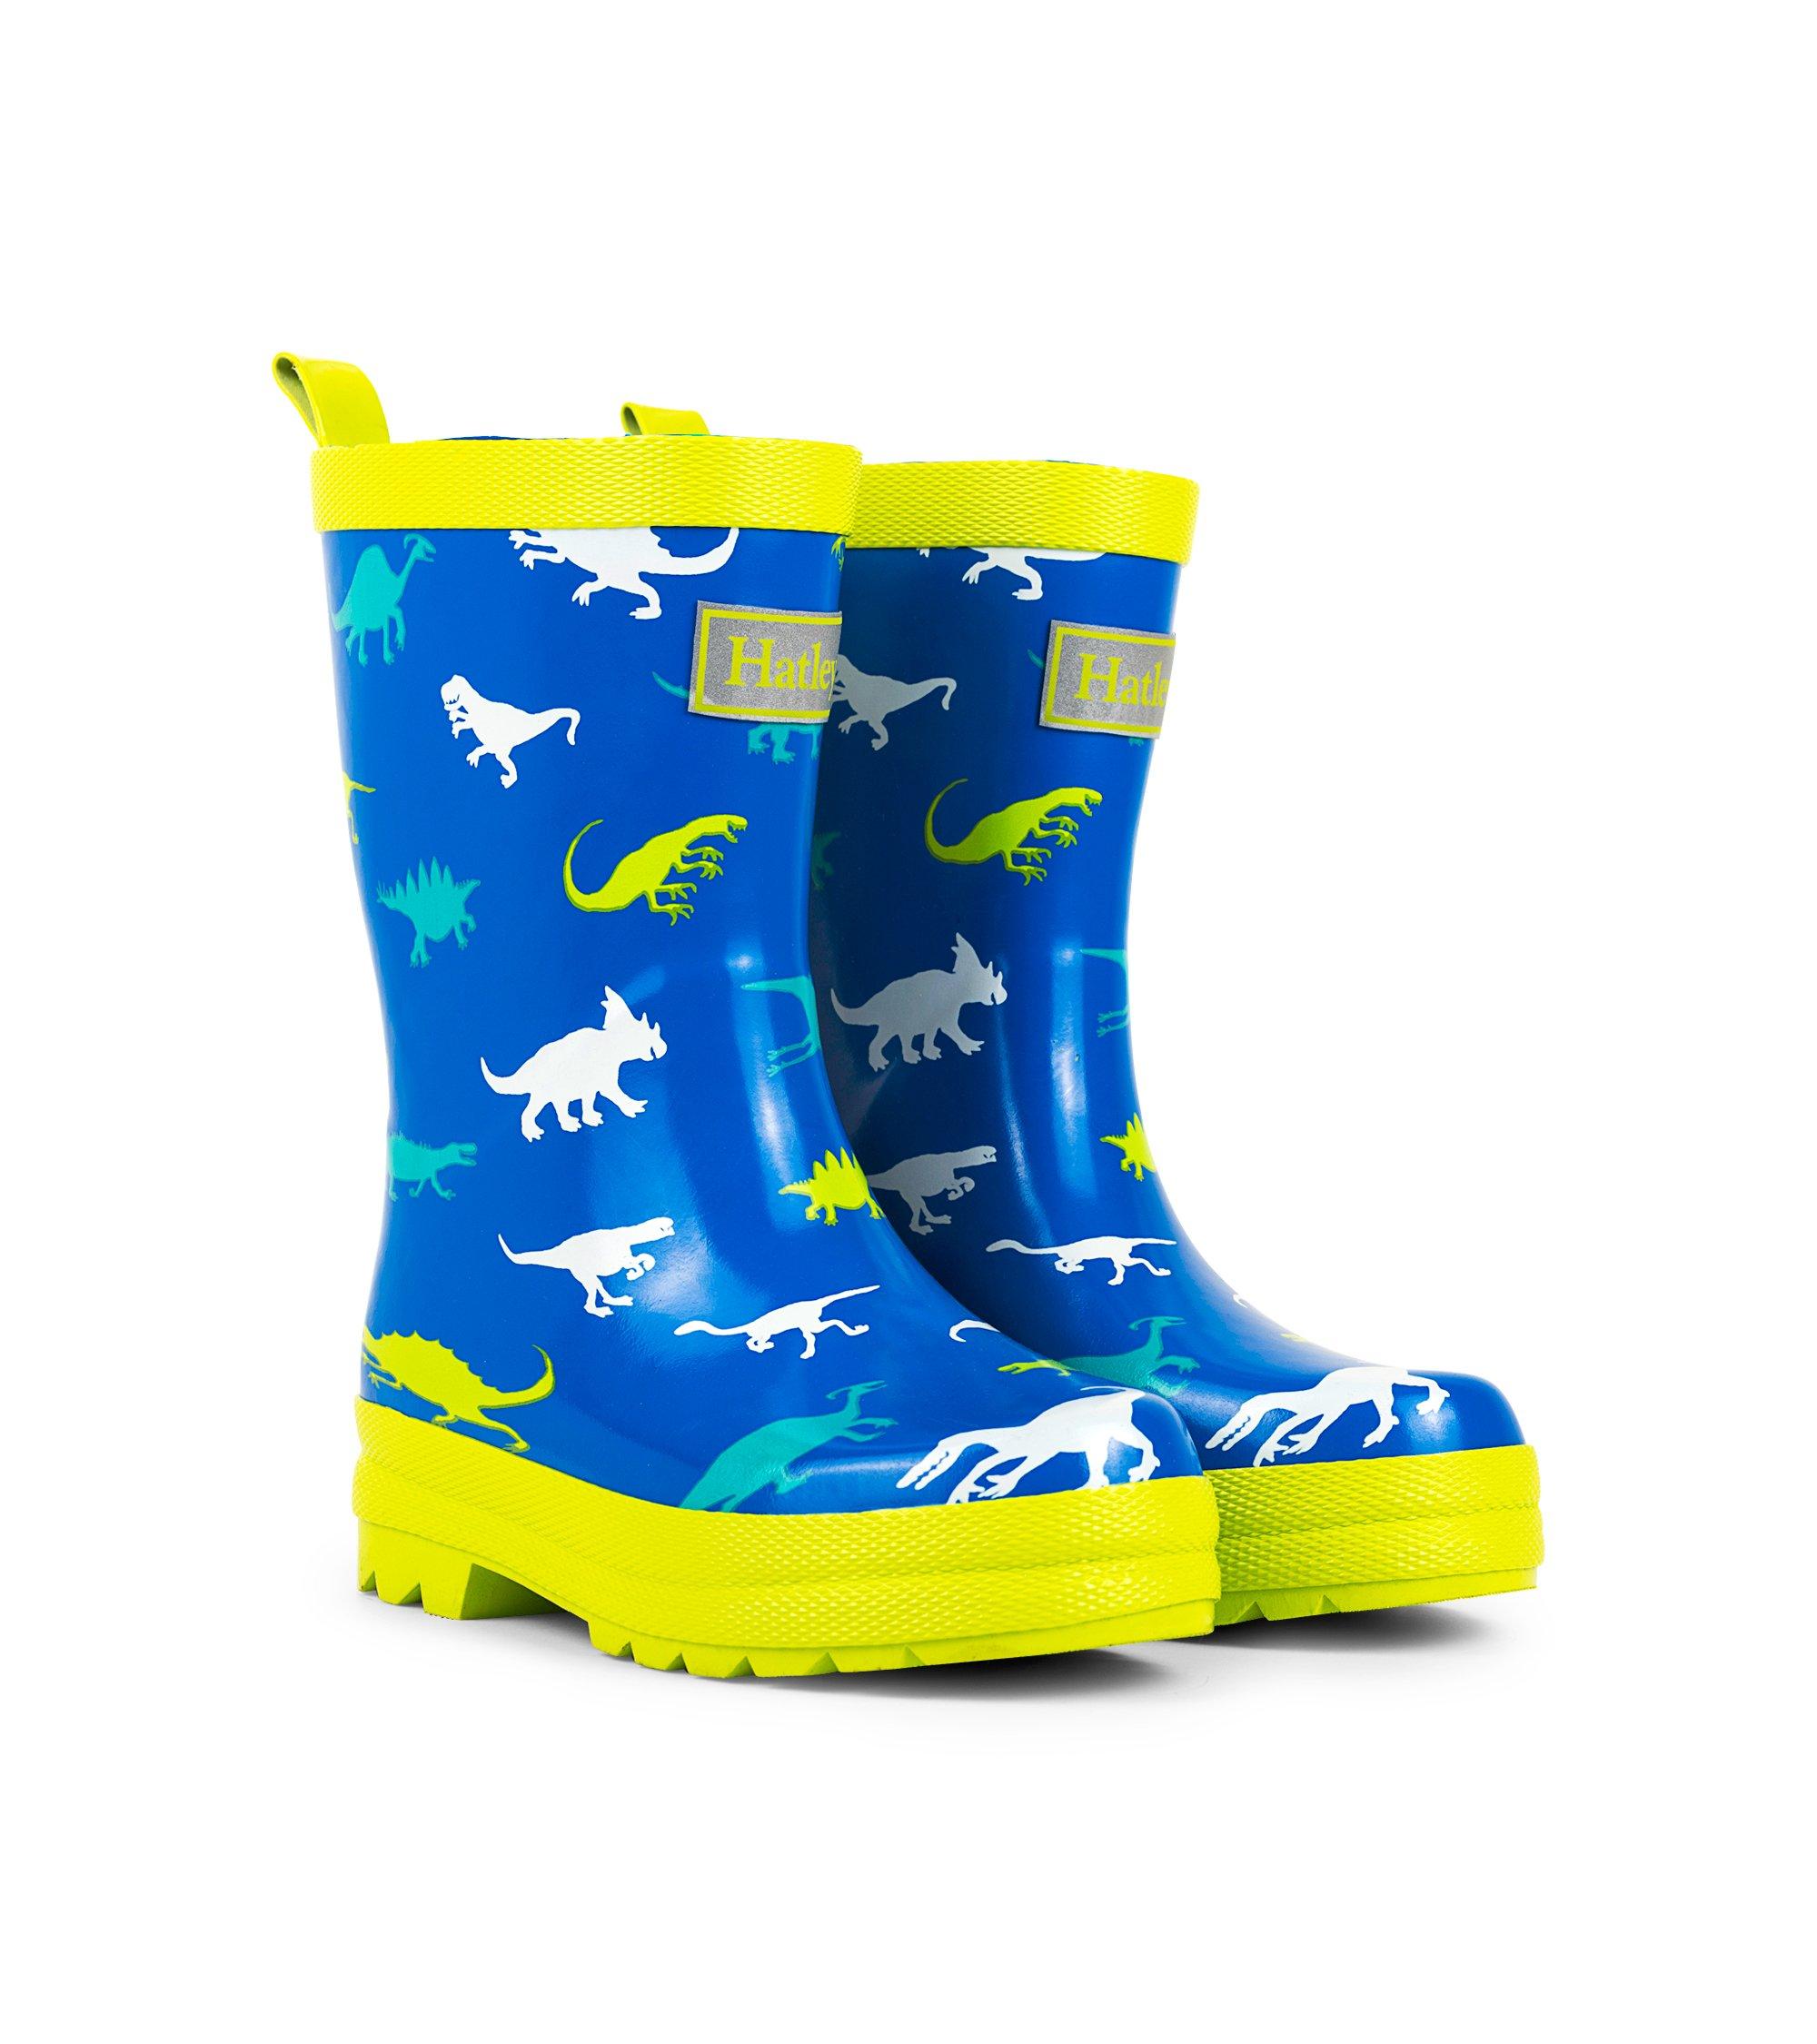 Hatley Boys' Printed Rain Boots Raincoat, Dinosaur Menagerie, 9 US Child by Hatley